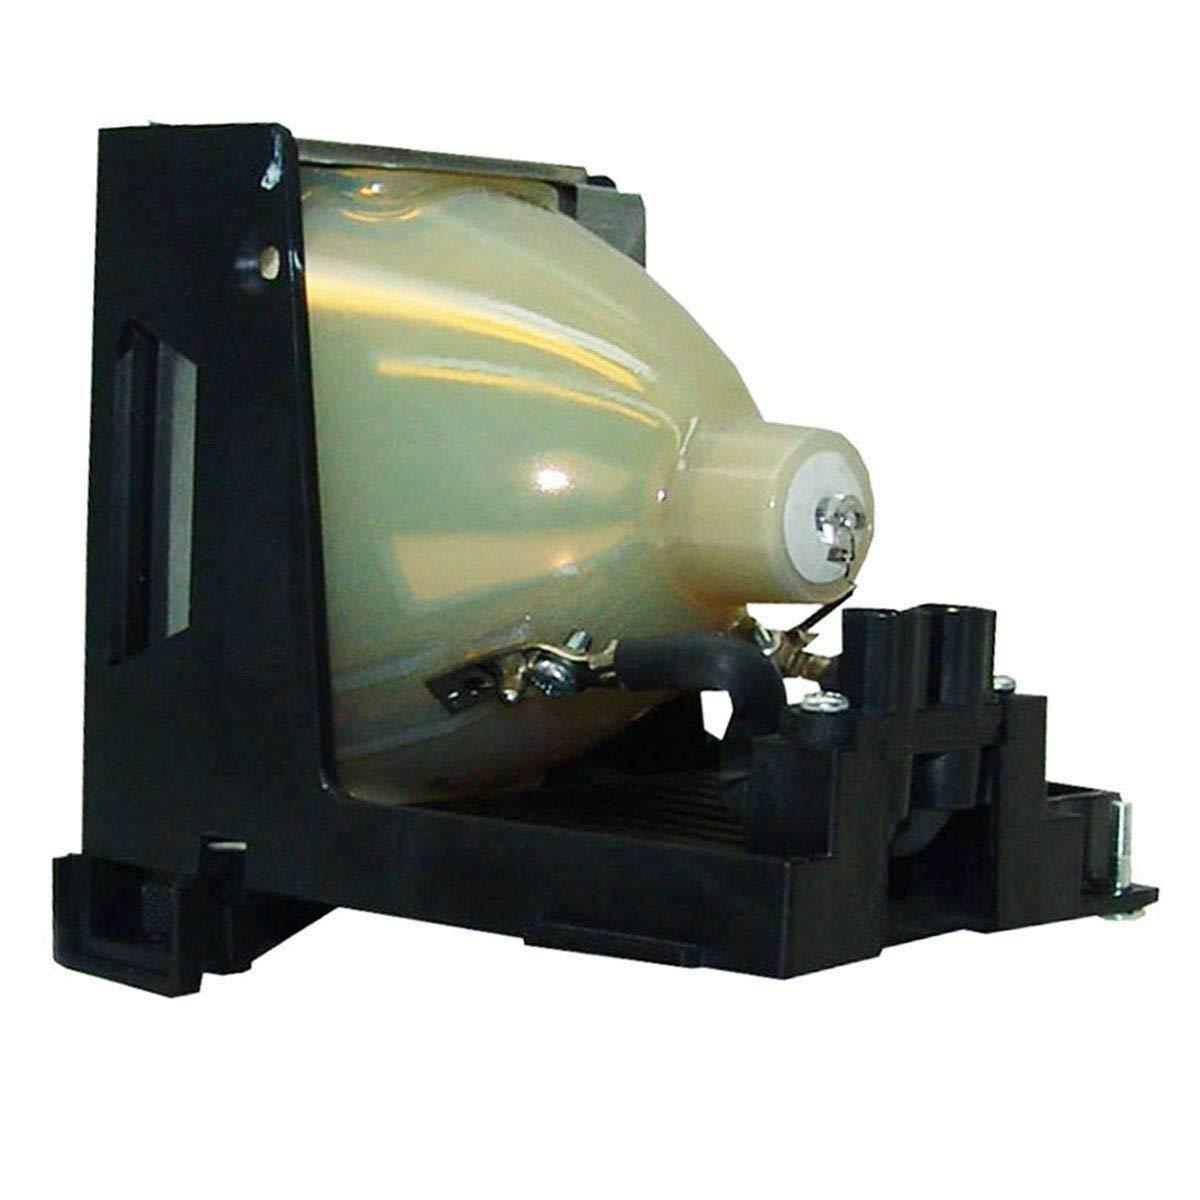 SpArc Platinum for Christie L2K1500 Projector Lamp Bulb Only